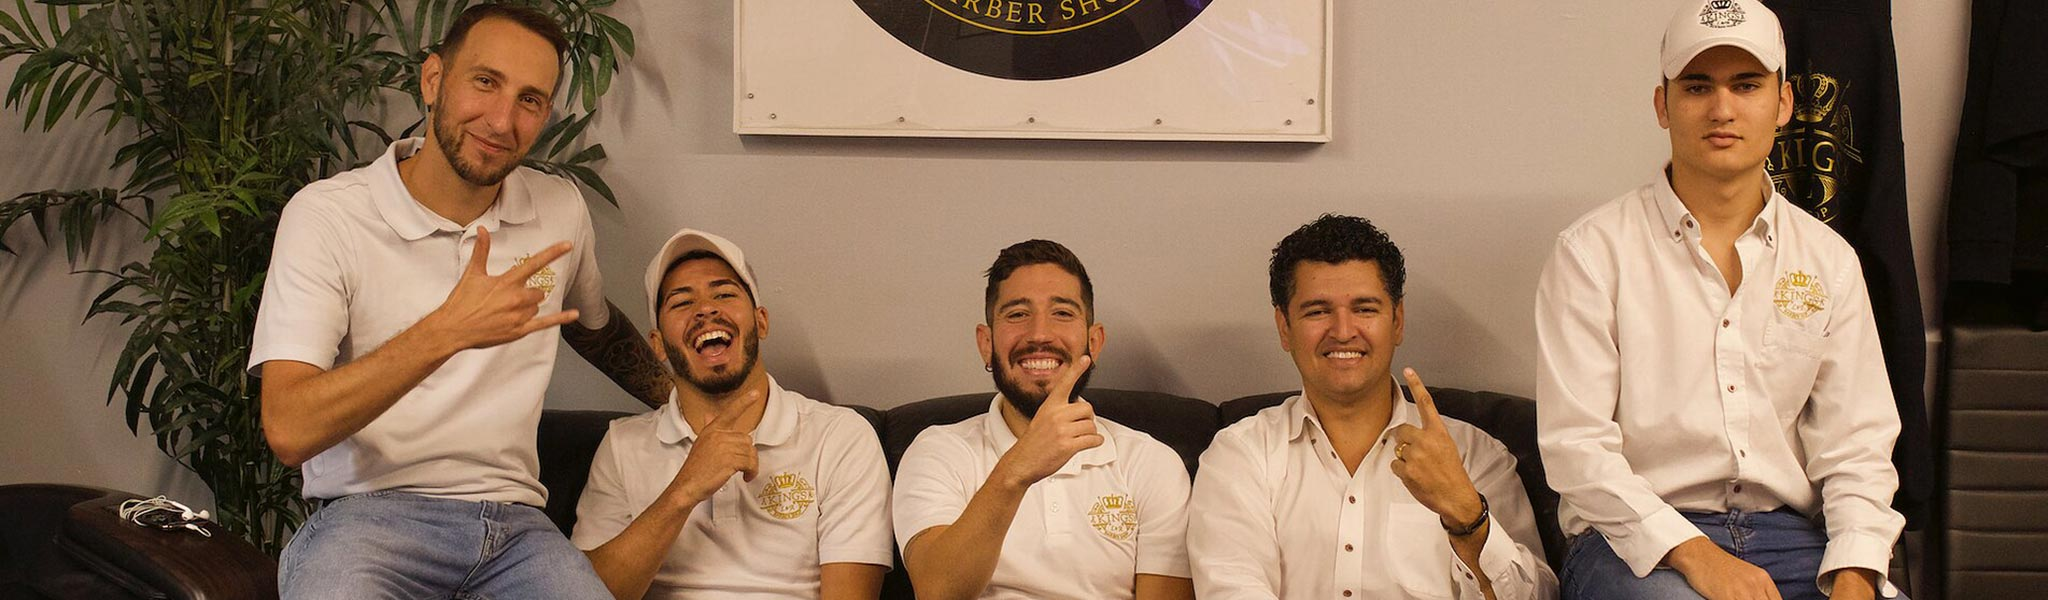 Kings Barber Shop team